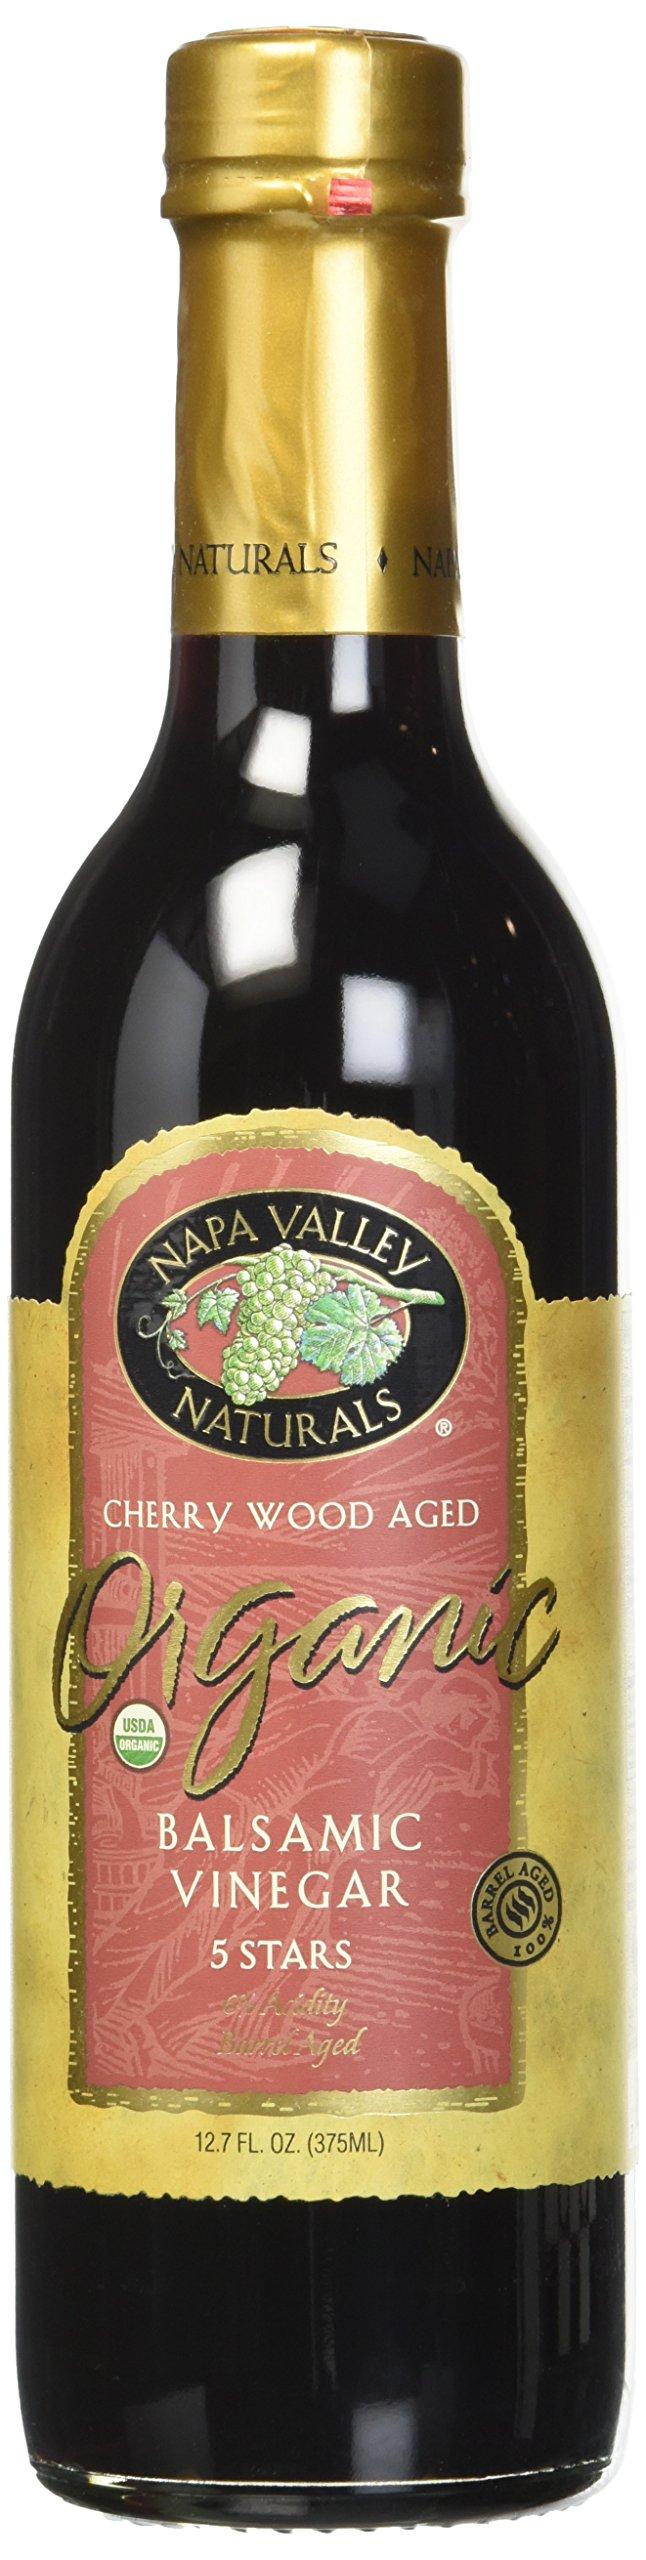 Napa Valley Naturals Organic Balsamic Vinegar 12.7 fl oz Liquid